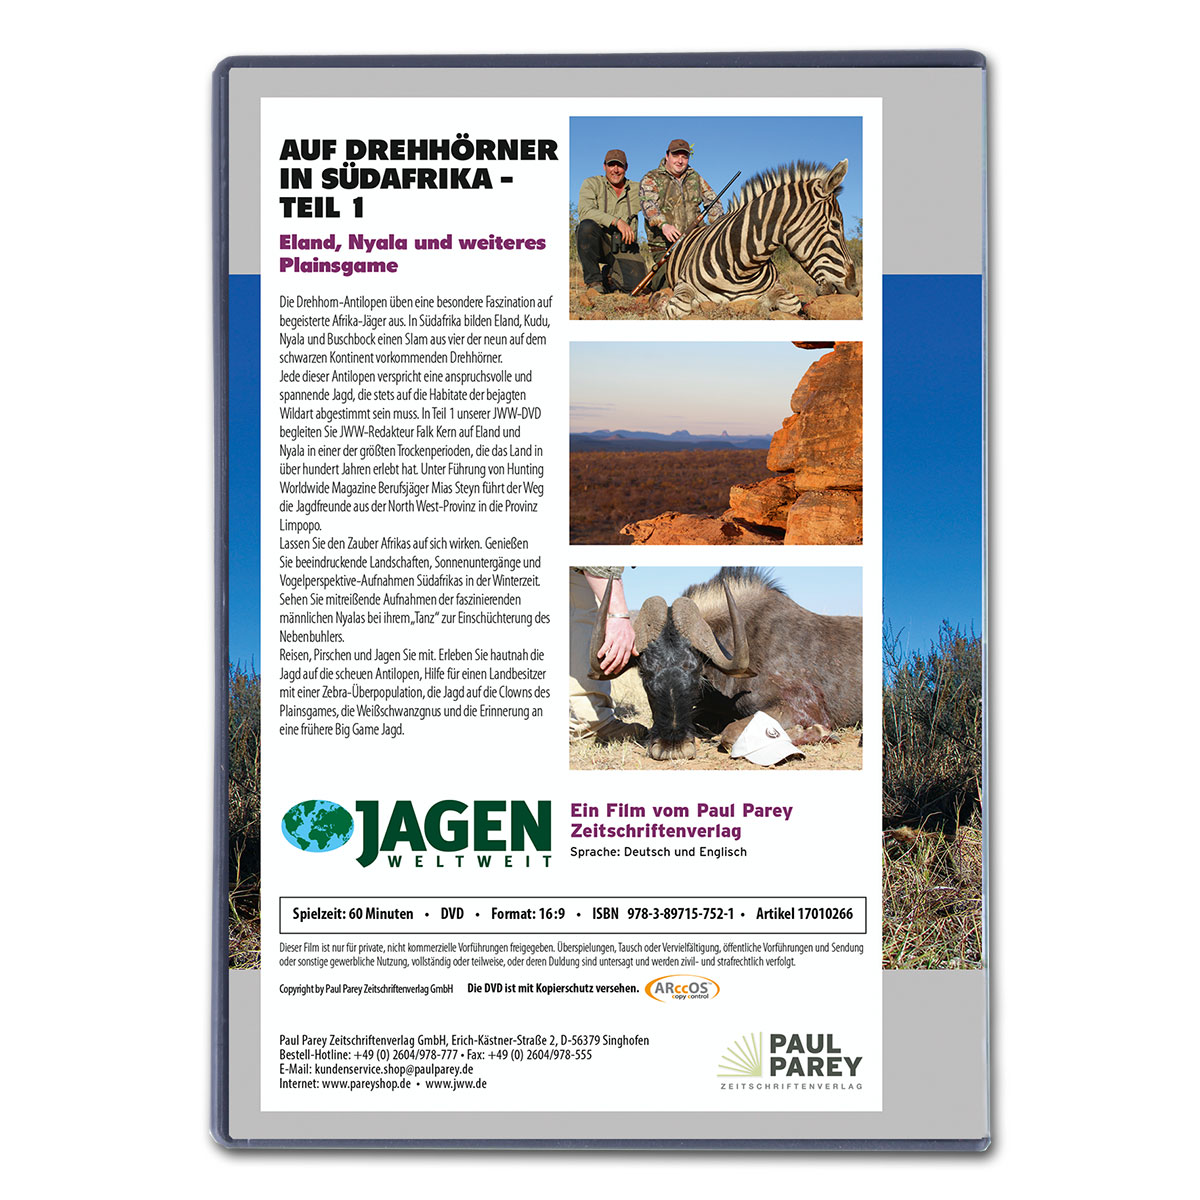 Auf Drehhörner in Südafrika (Teil 1) - JWW DVD Nr. 47 im Pareyshop